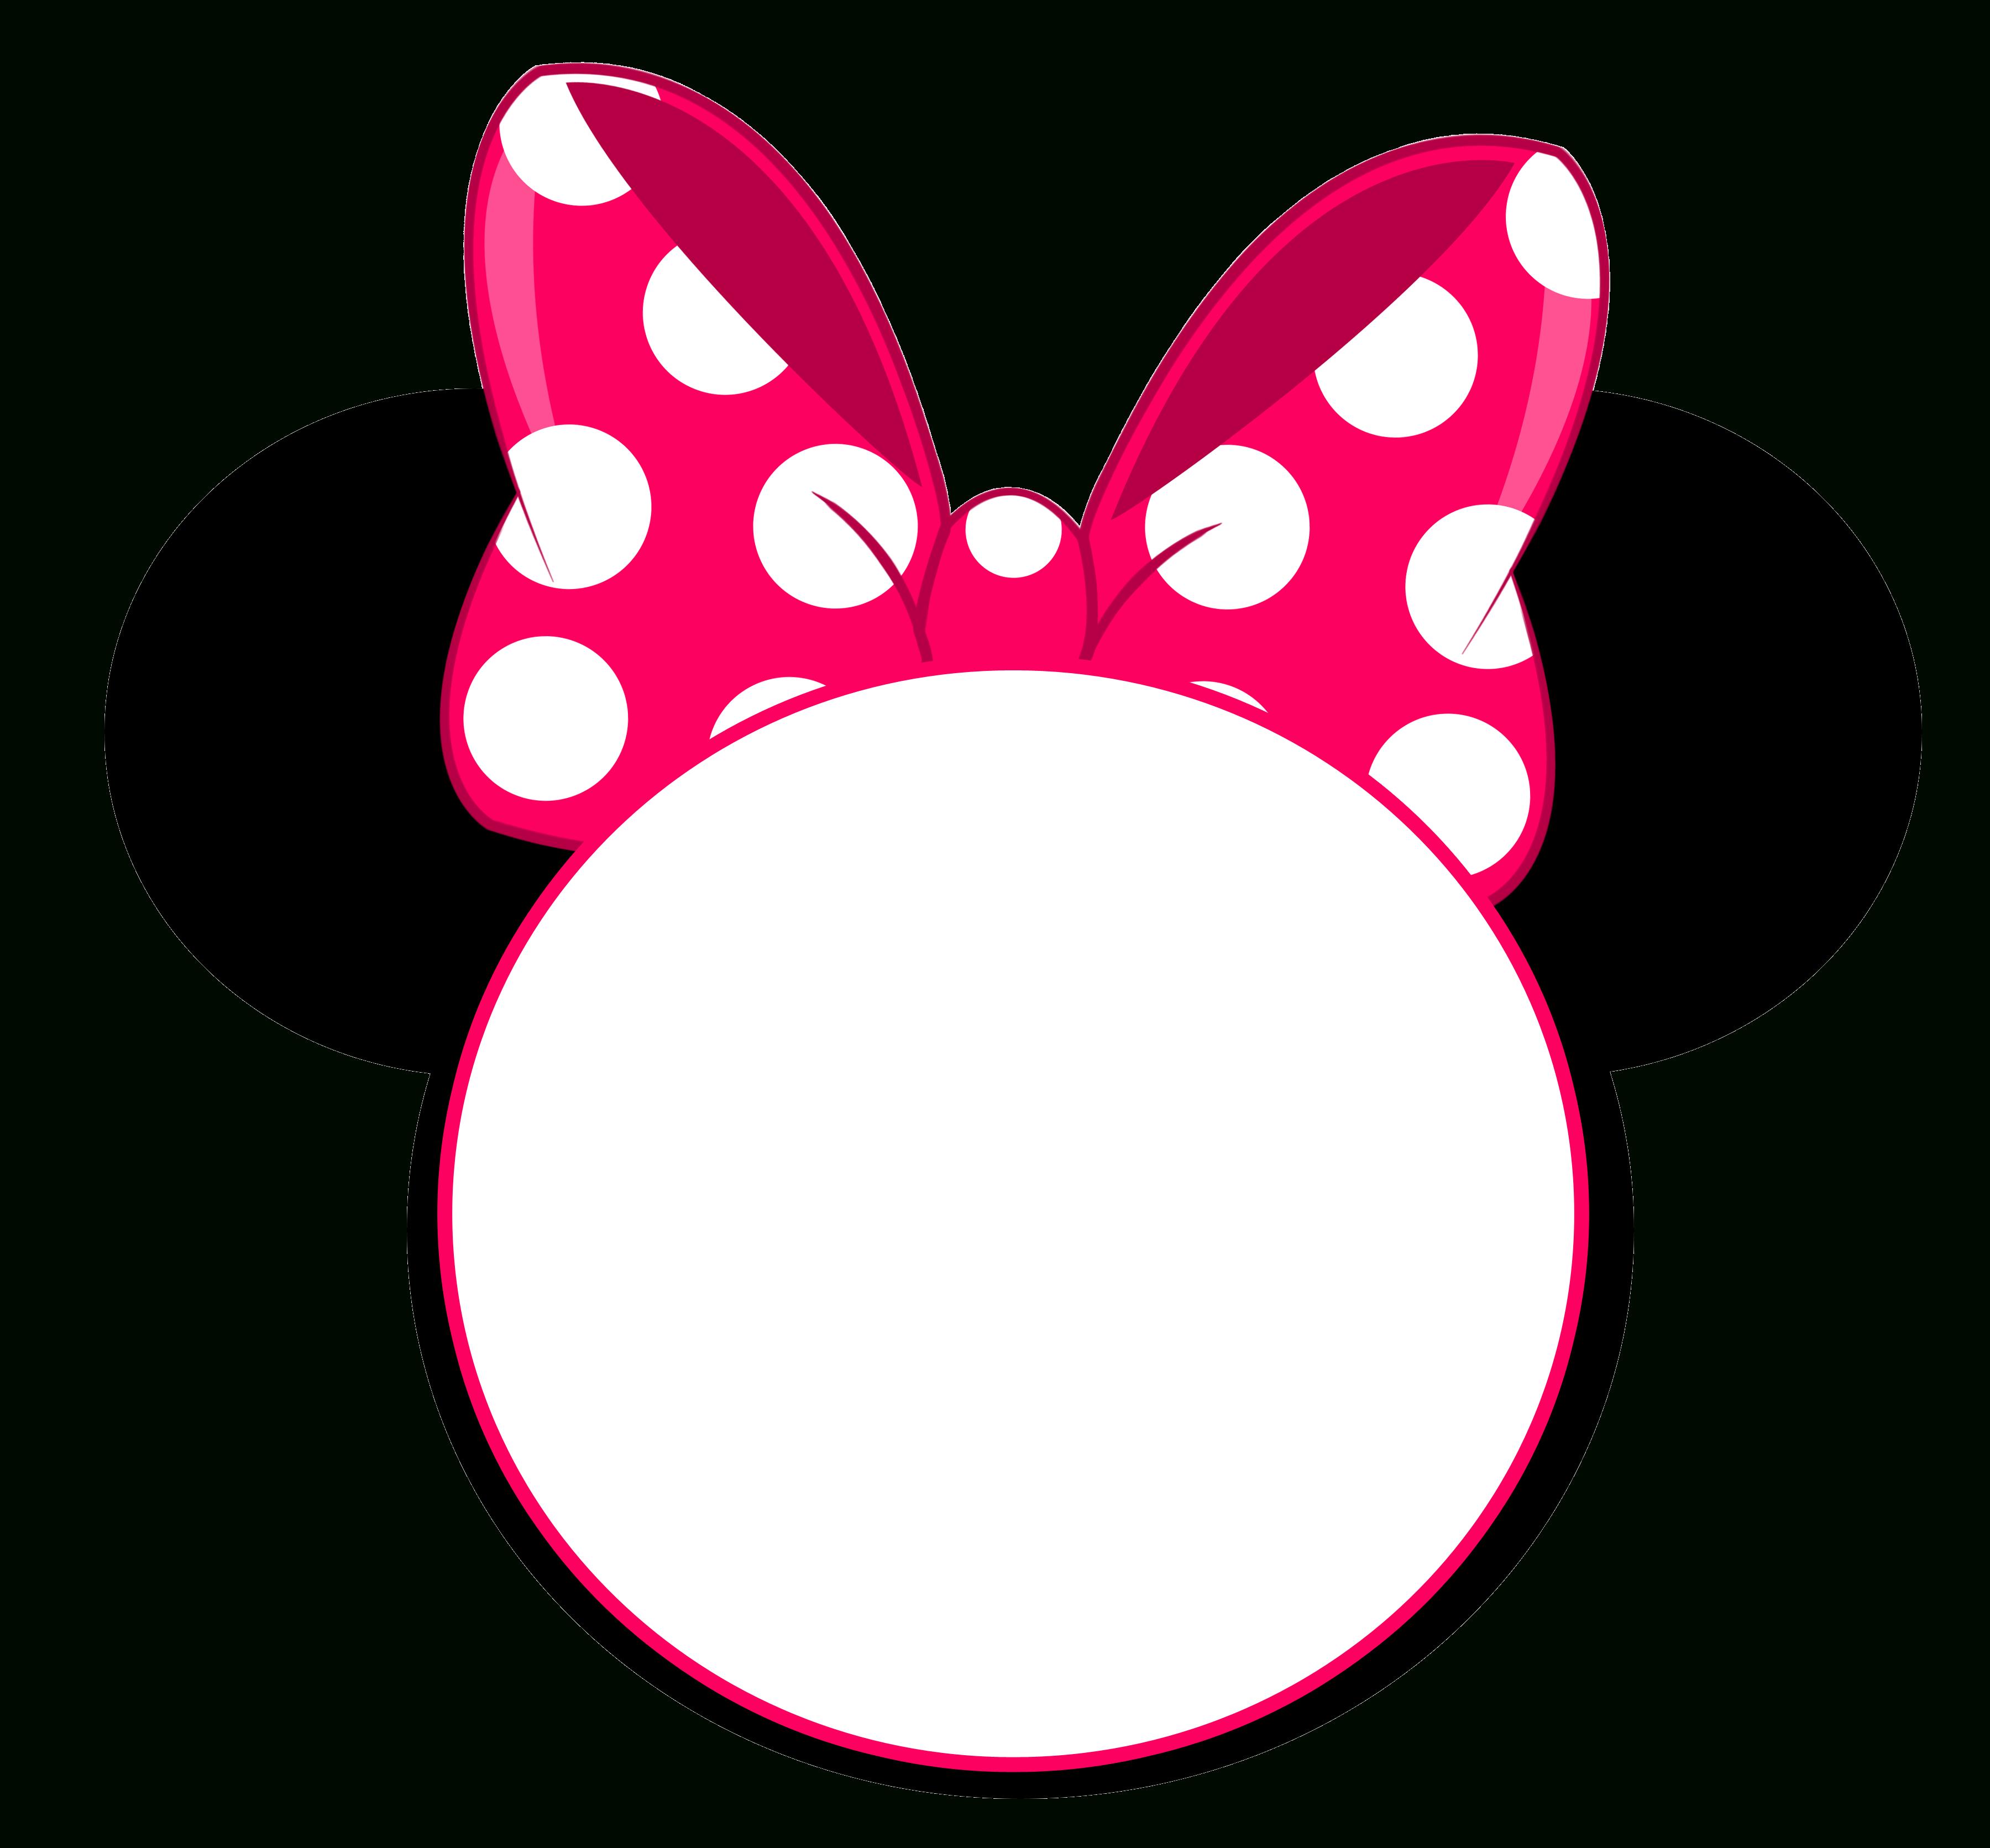 Free Printable Minnie Mouse Pinky Birthday Invitation   Minnie's - Free Minnie Mouse Printable Templates